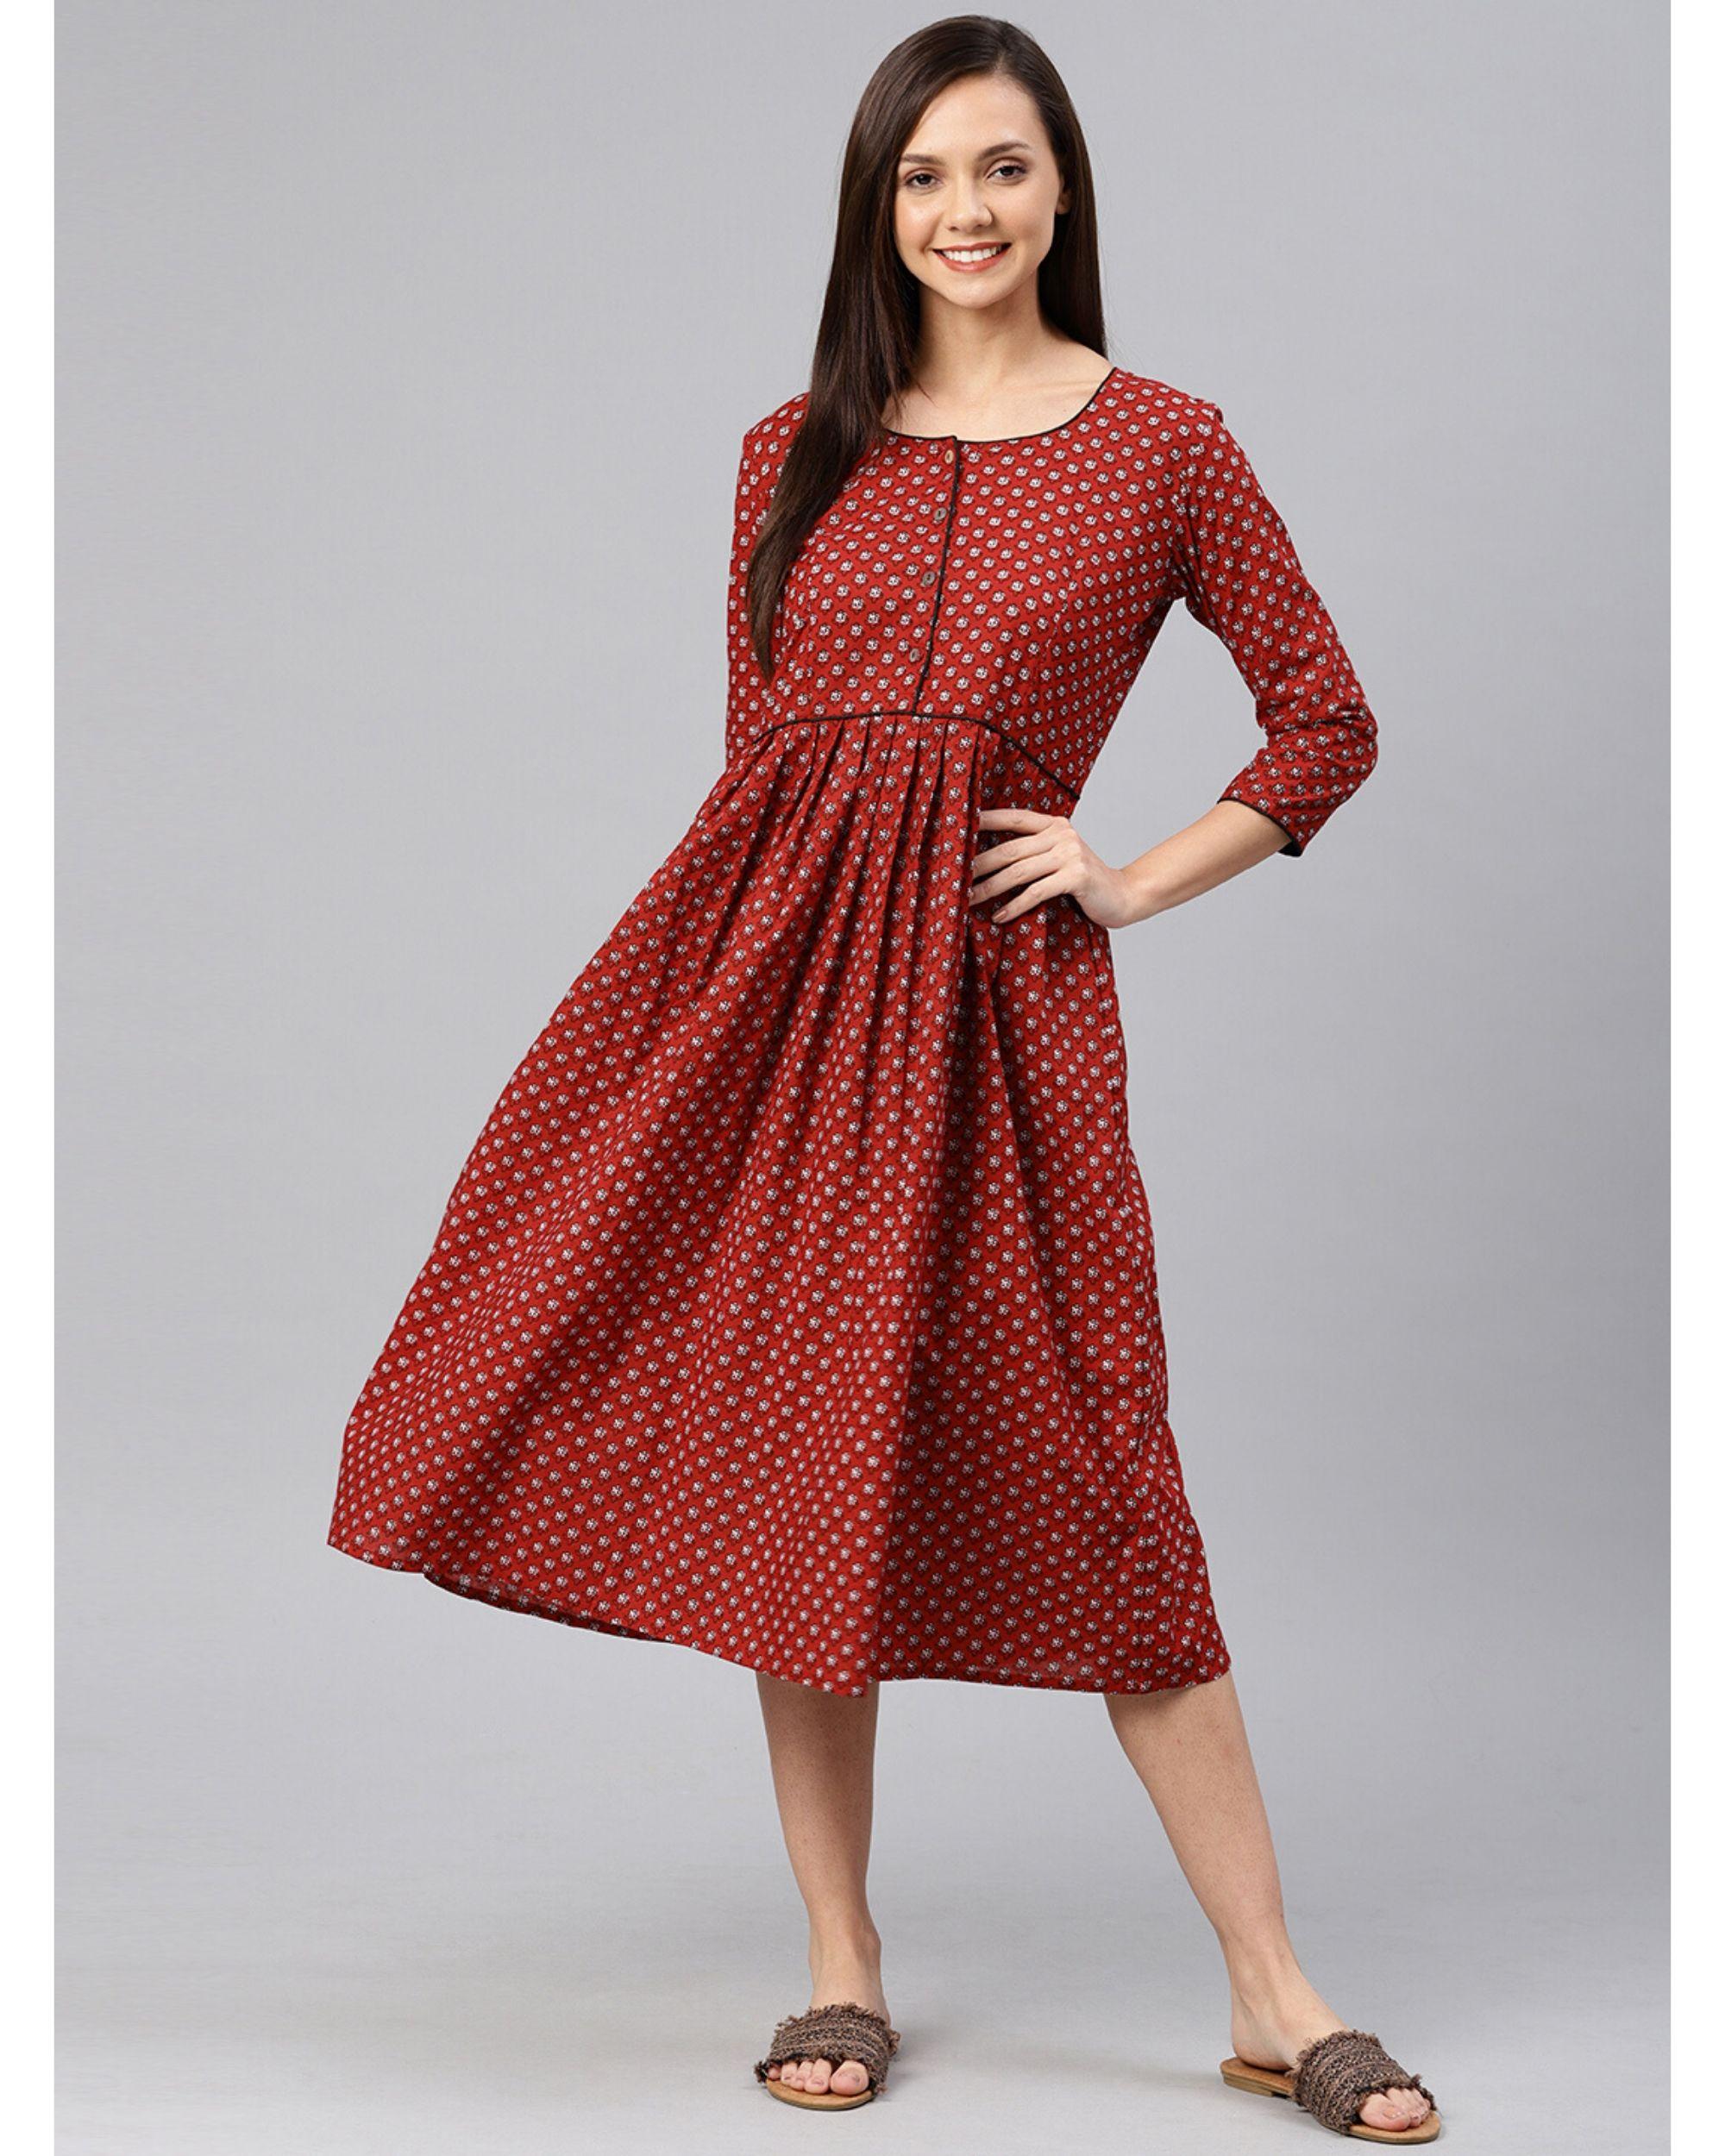 Maroon floral pleated dress